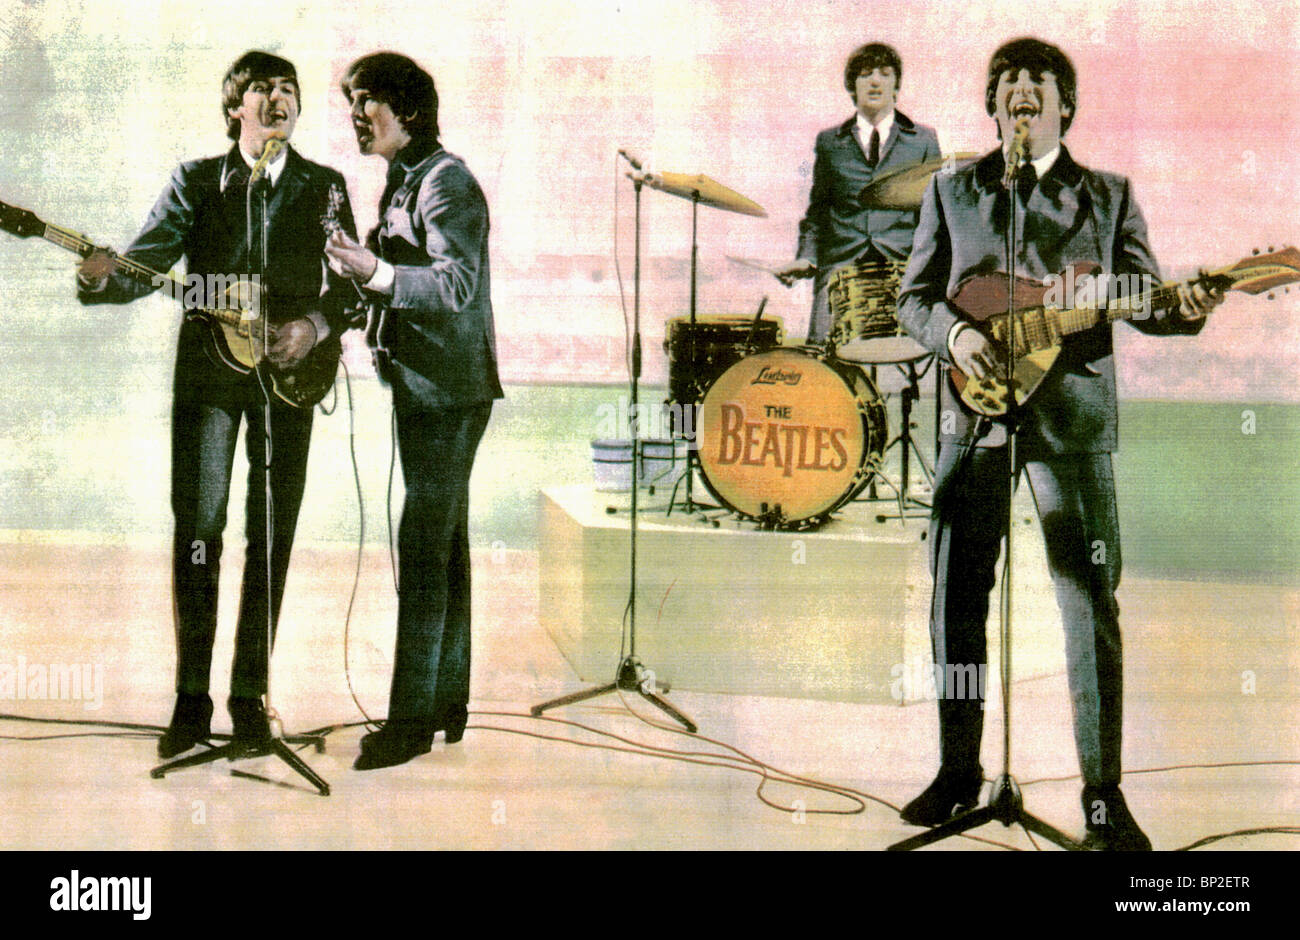 PAUL MCCARTNEY, George Harrison, Ringo Starr, JOHN LENNON, UNE DURE JOURNÉE DE NUIT, 1964 Photo Stock